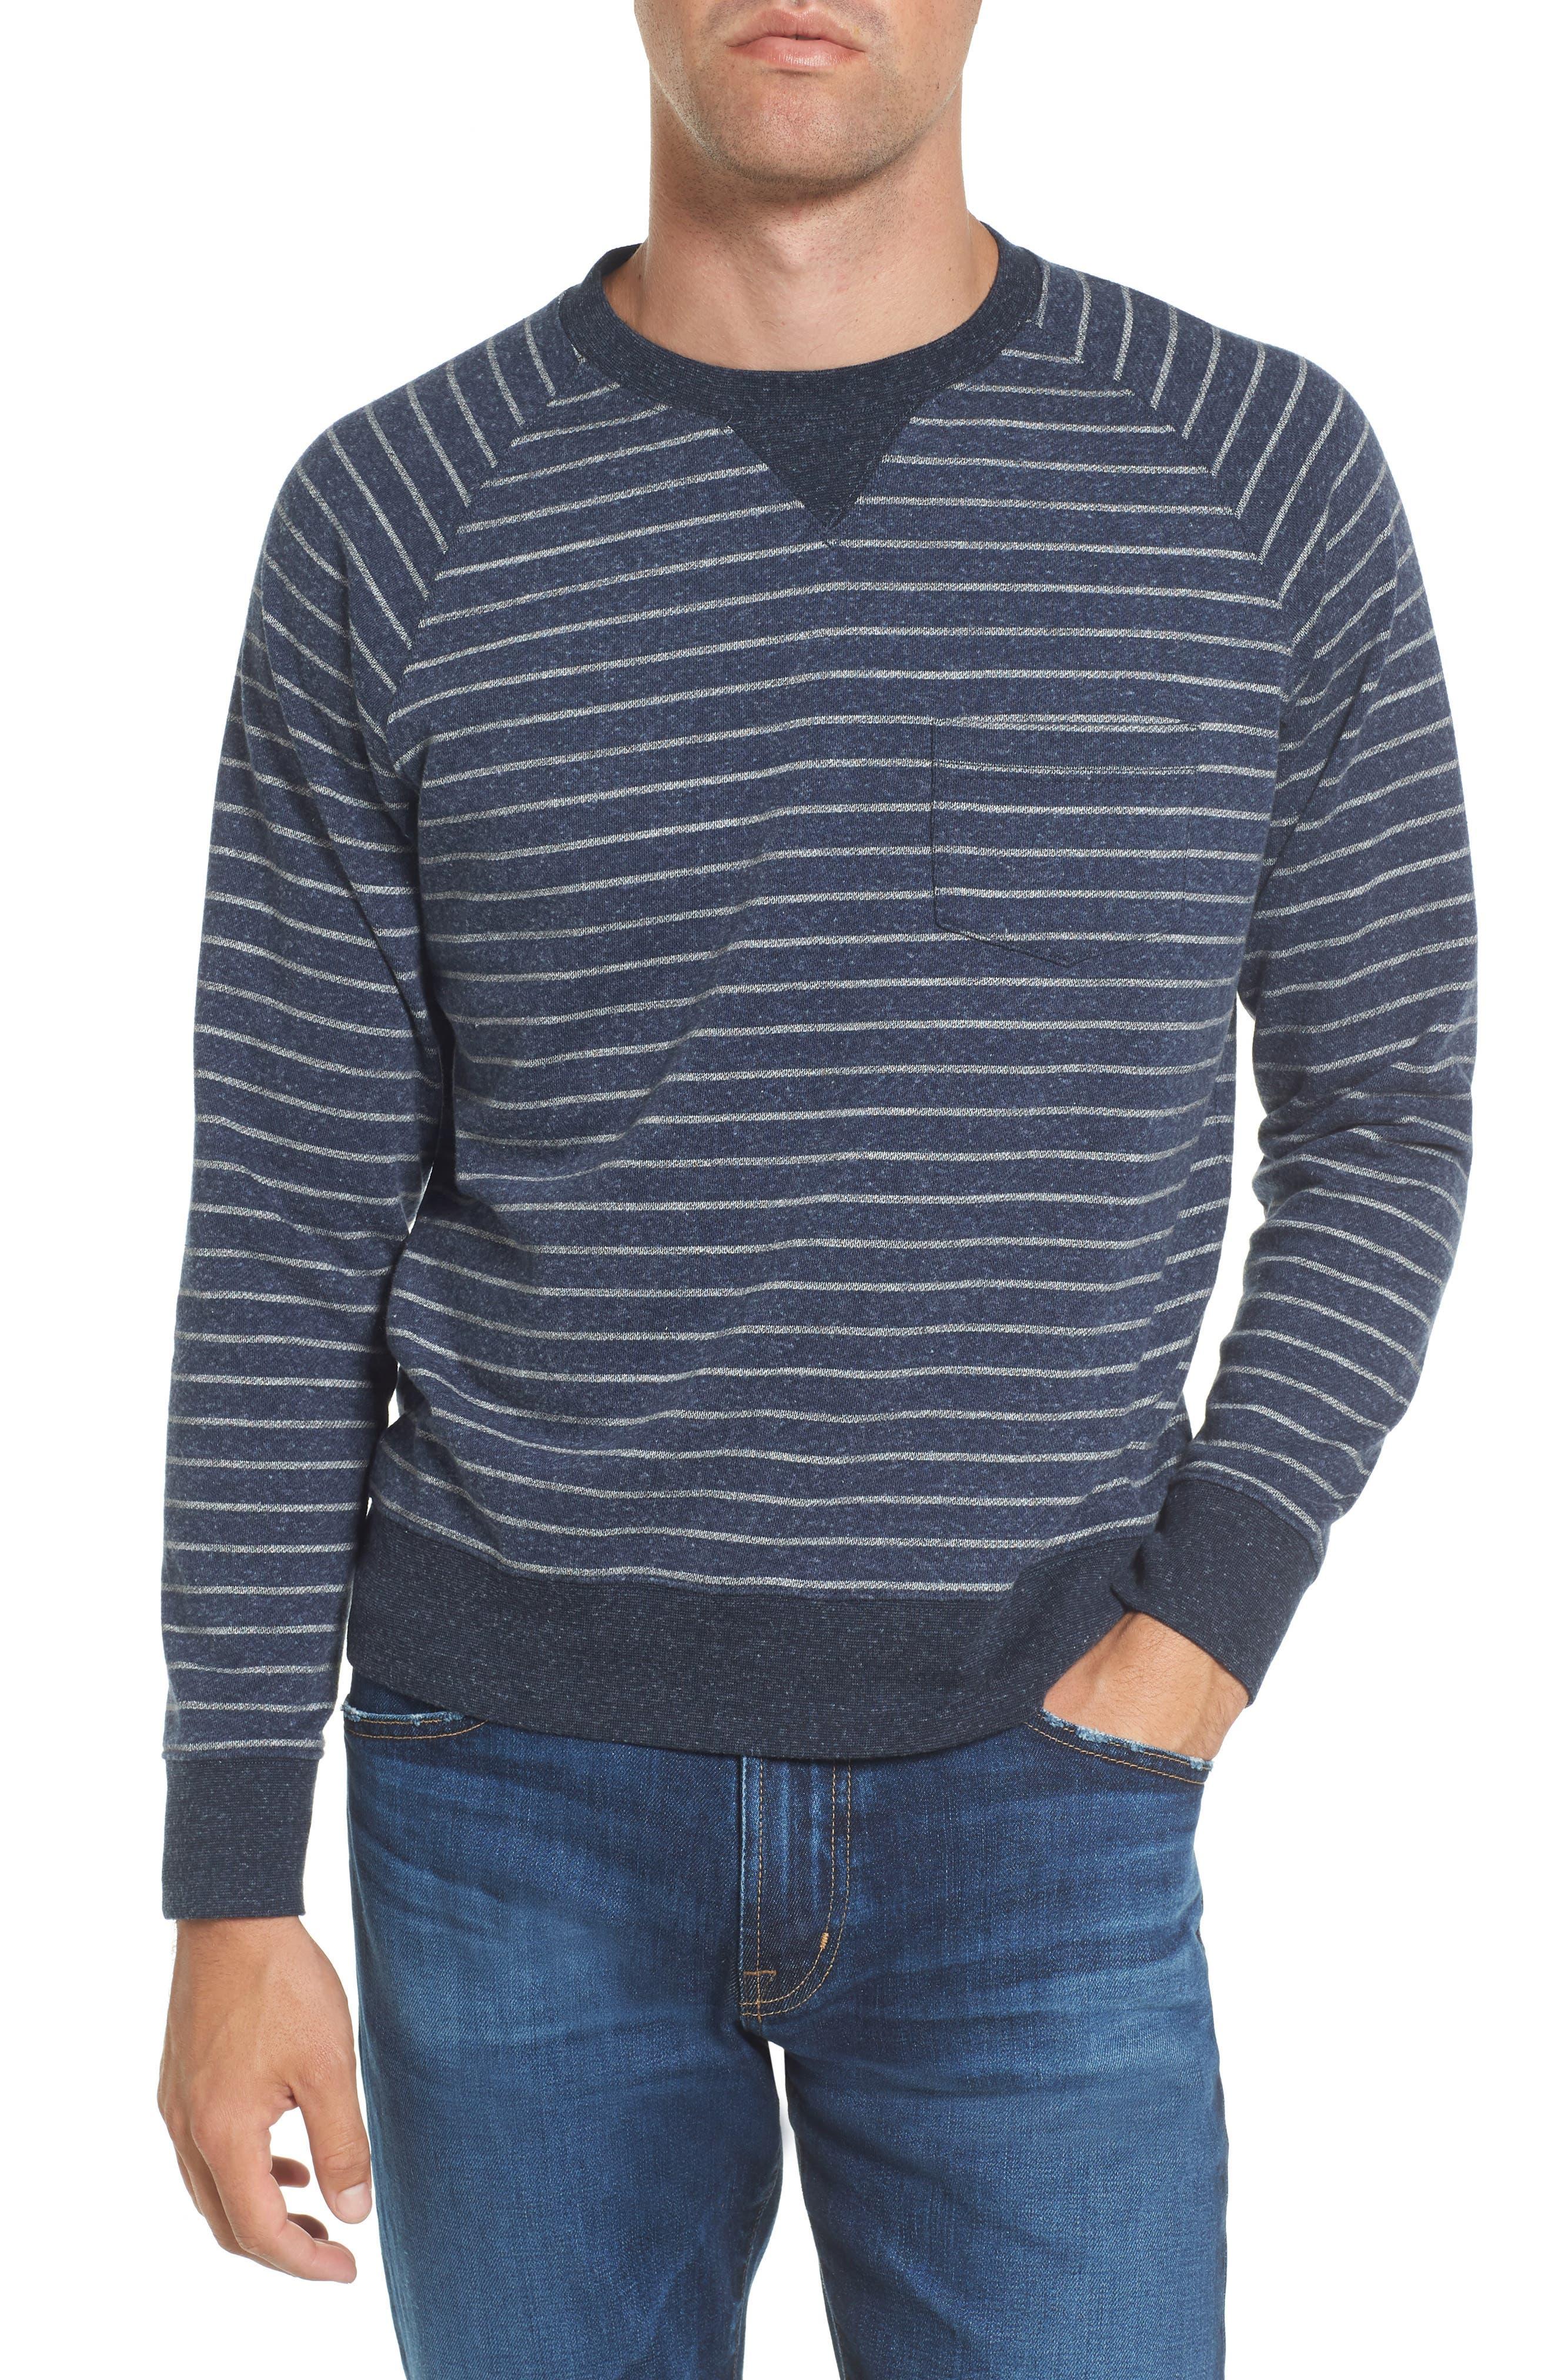 Palmer Modern Fit Athletic Stripe Sweatshirt,                             Main thumbnail 1, color,                             468